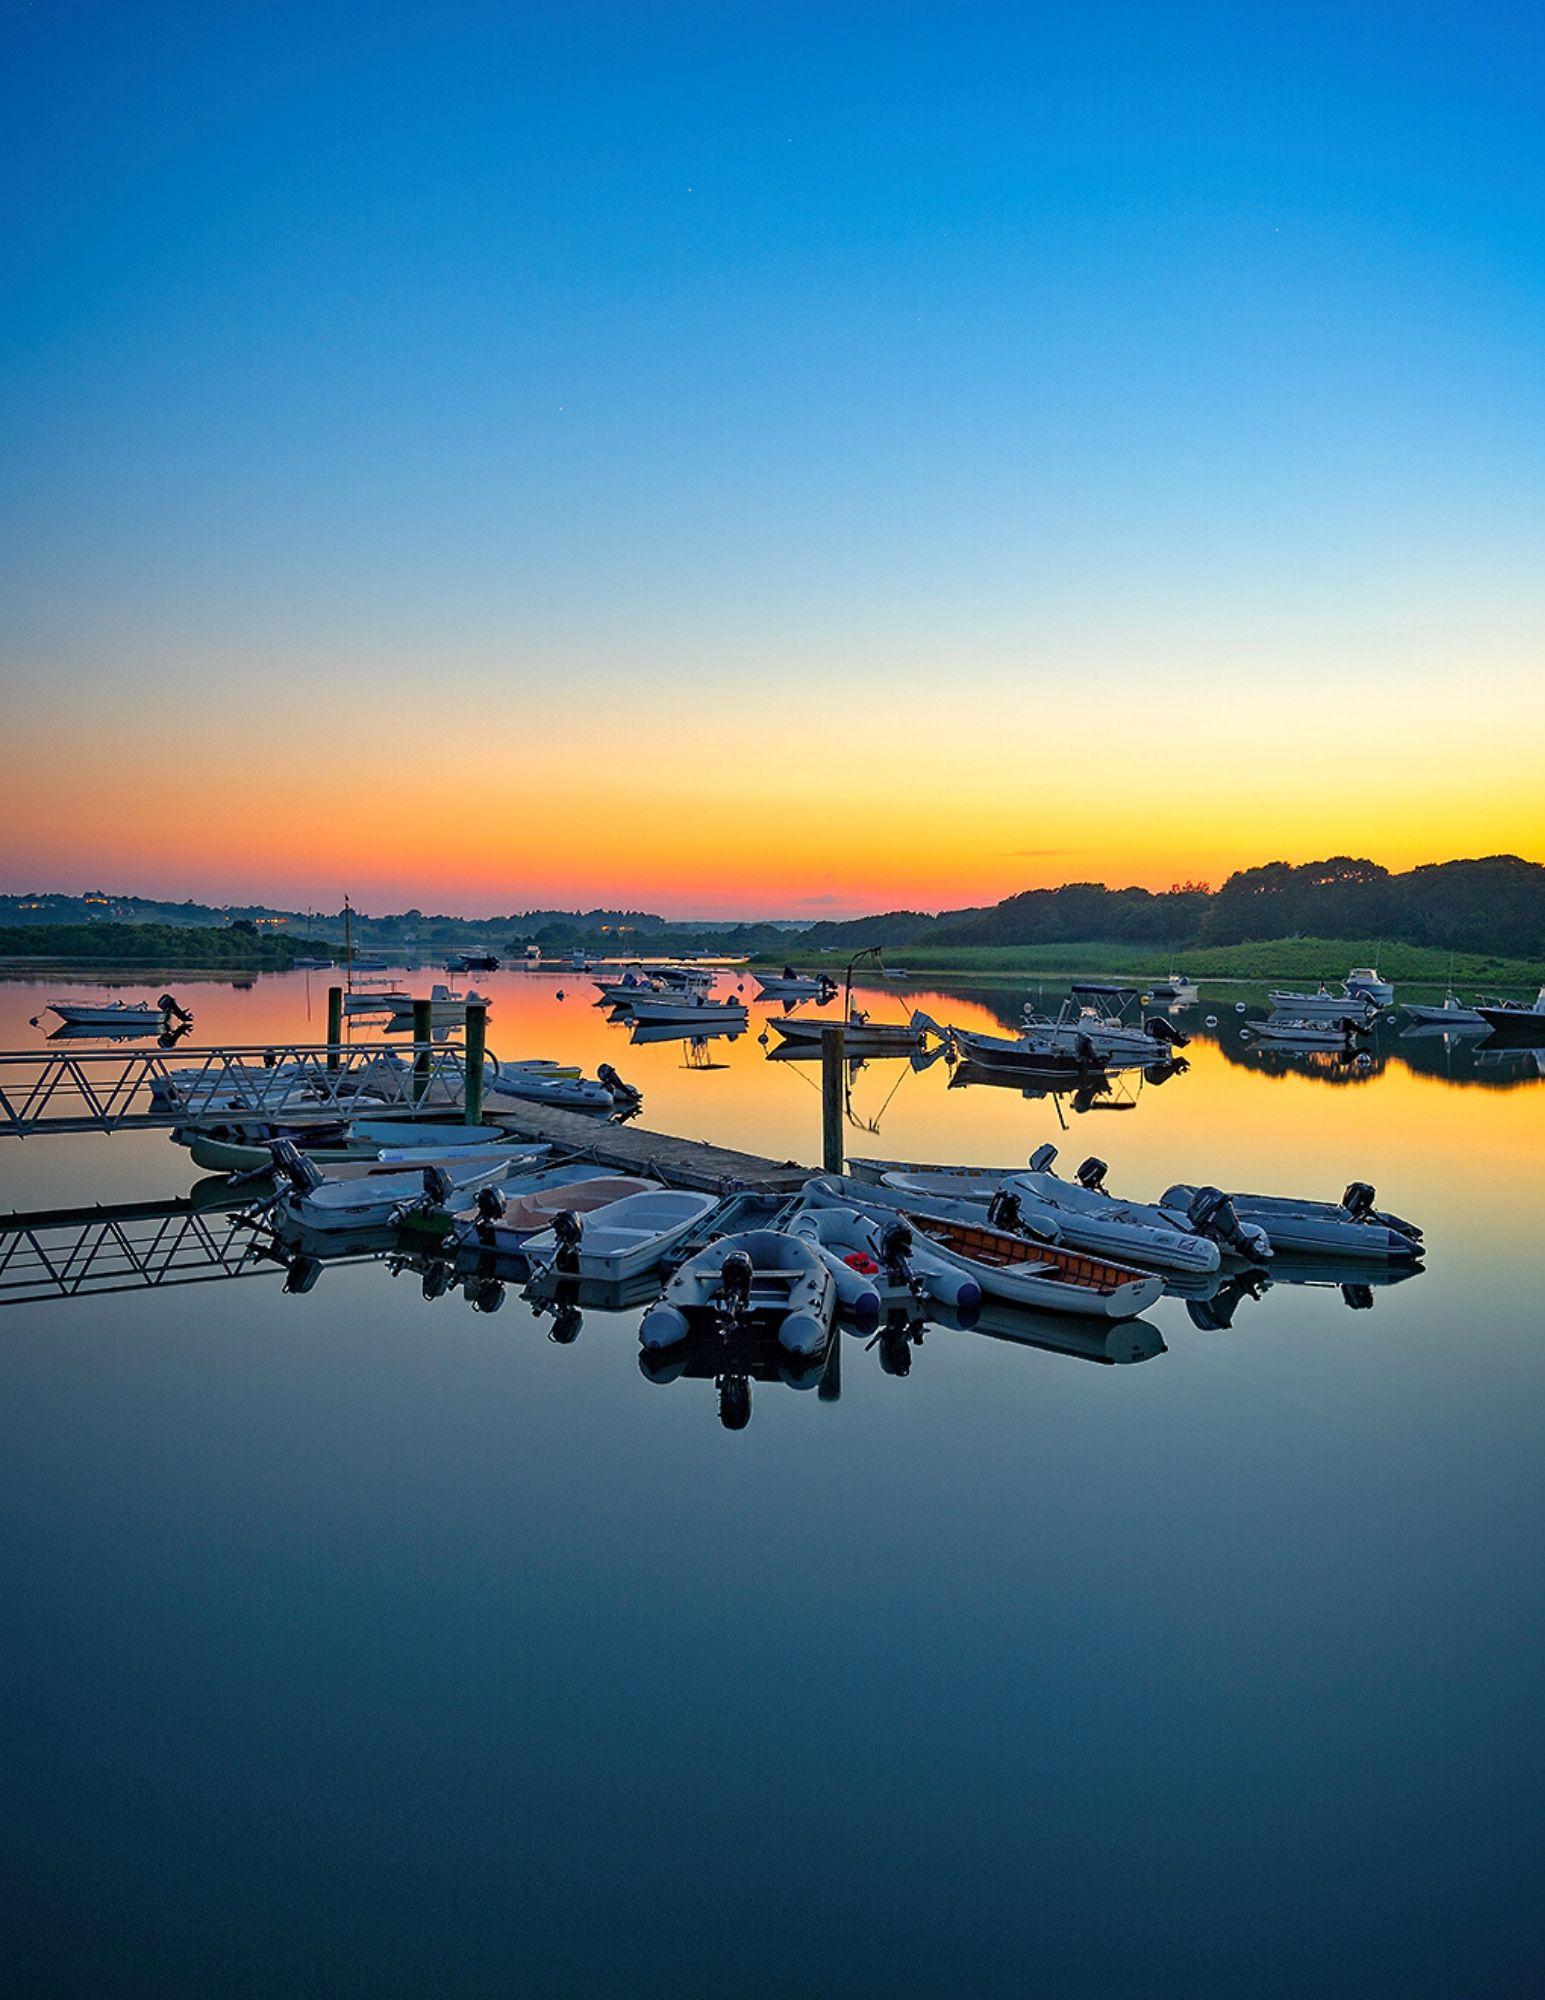 John Montes Jr Photography Best Places to Photograph Sunrise and Sunset on Marthas Vineyard-Best Places to Photograph Sunrise and Sunset on Marthas Vineyard-17